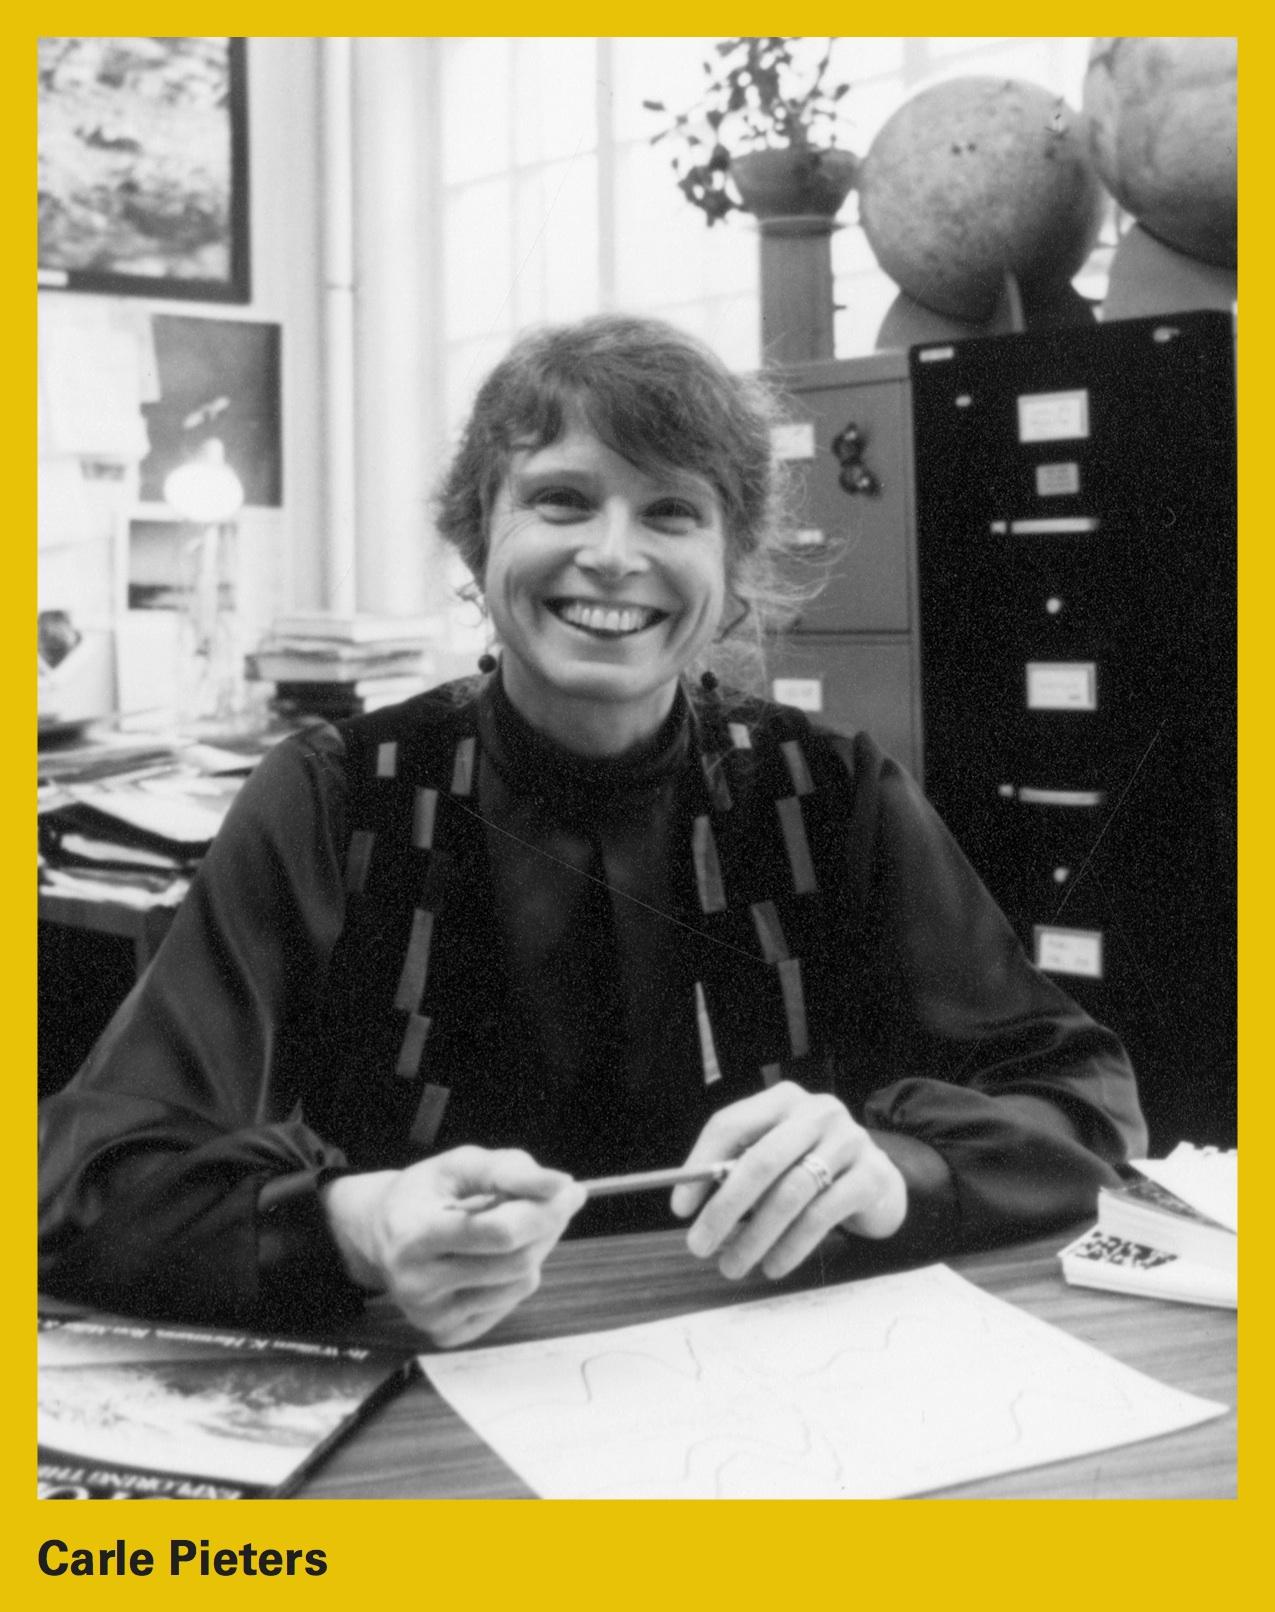 Photo by John Foraste. Brown University Archives.